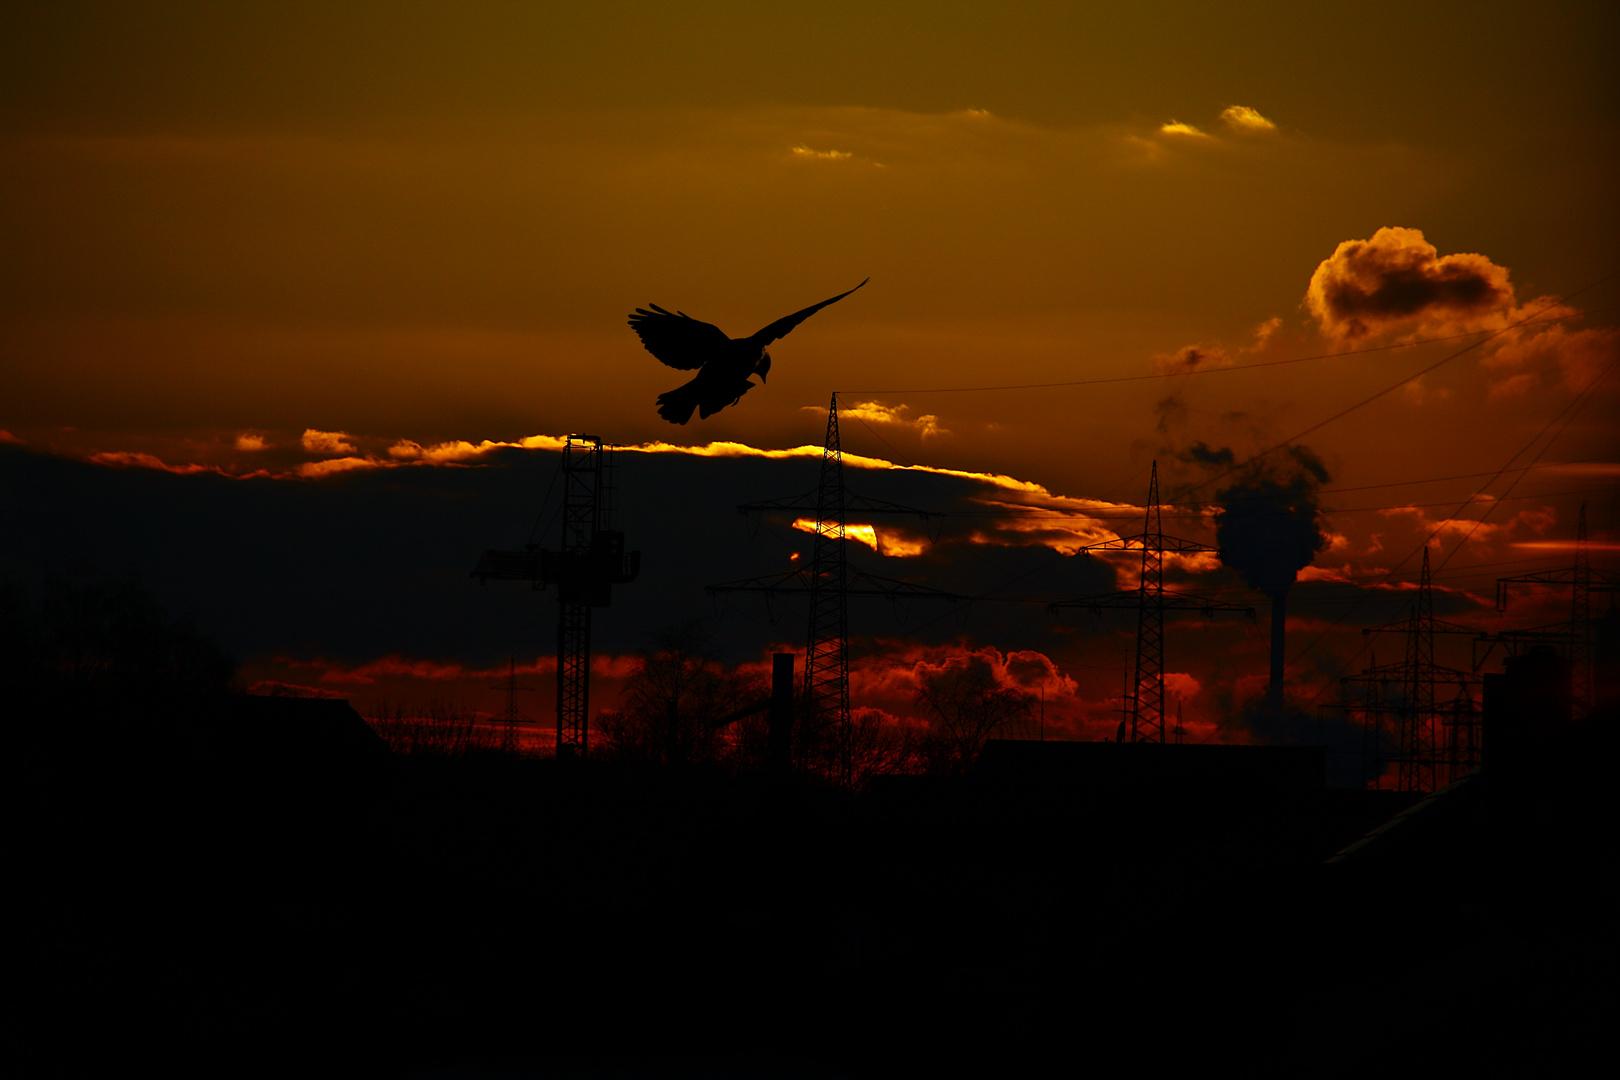 Sonnenuntergang in der Industrie